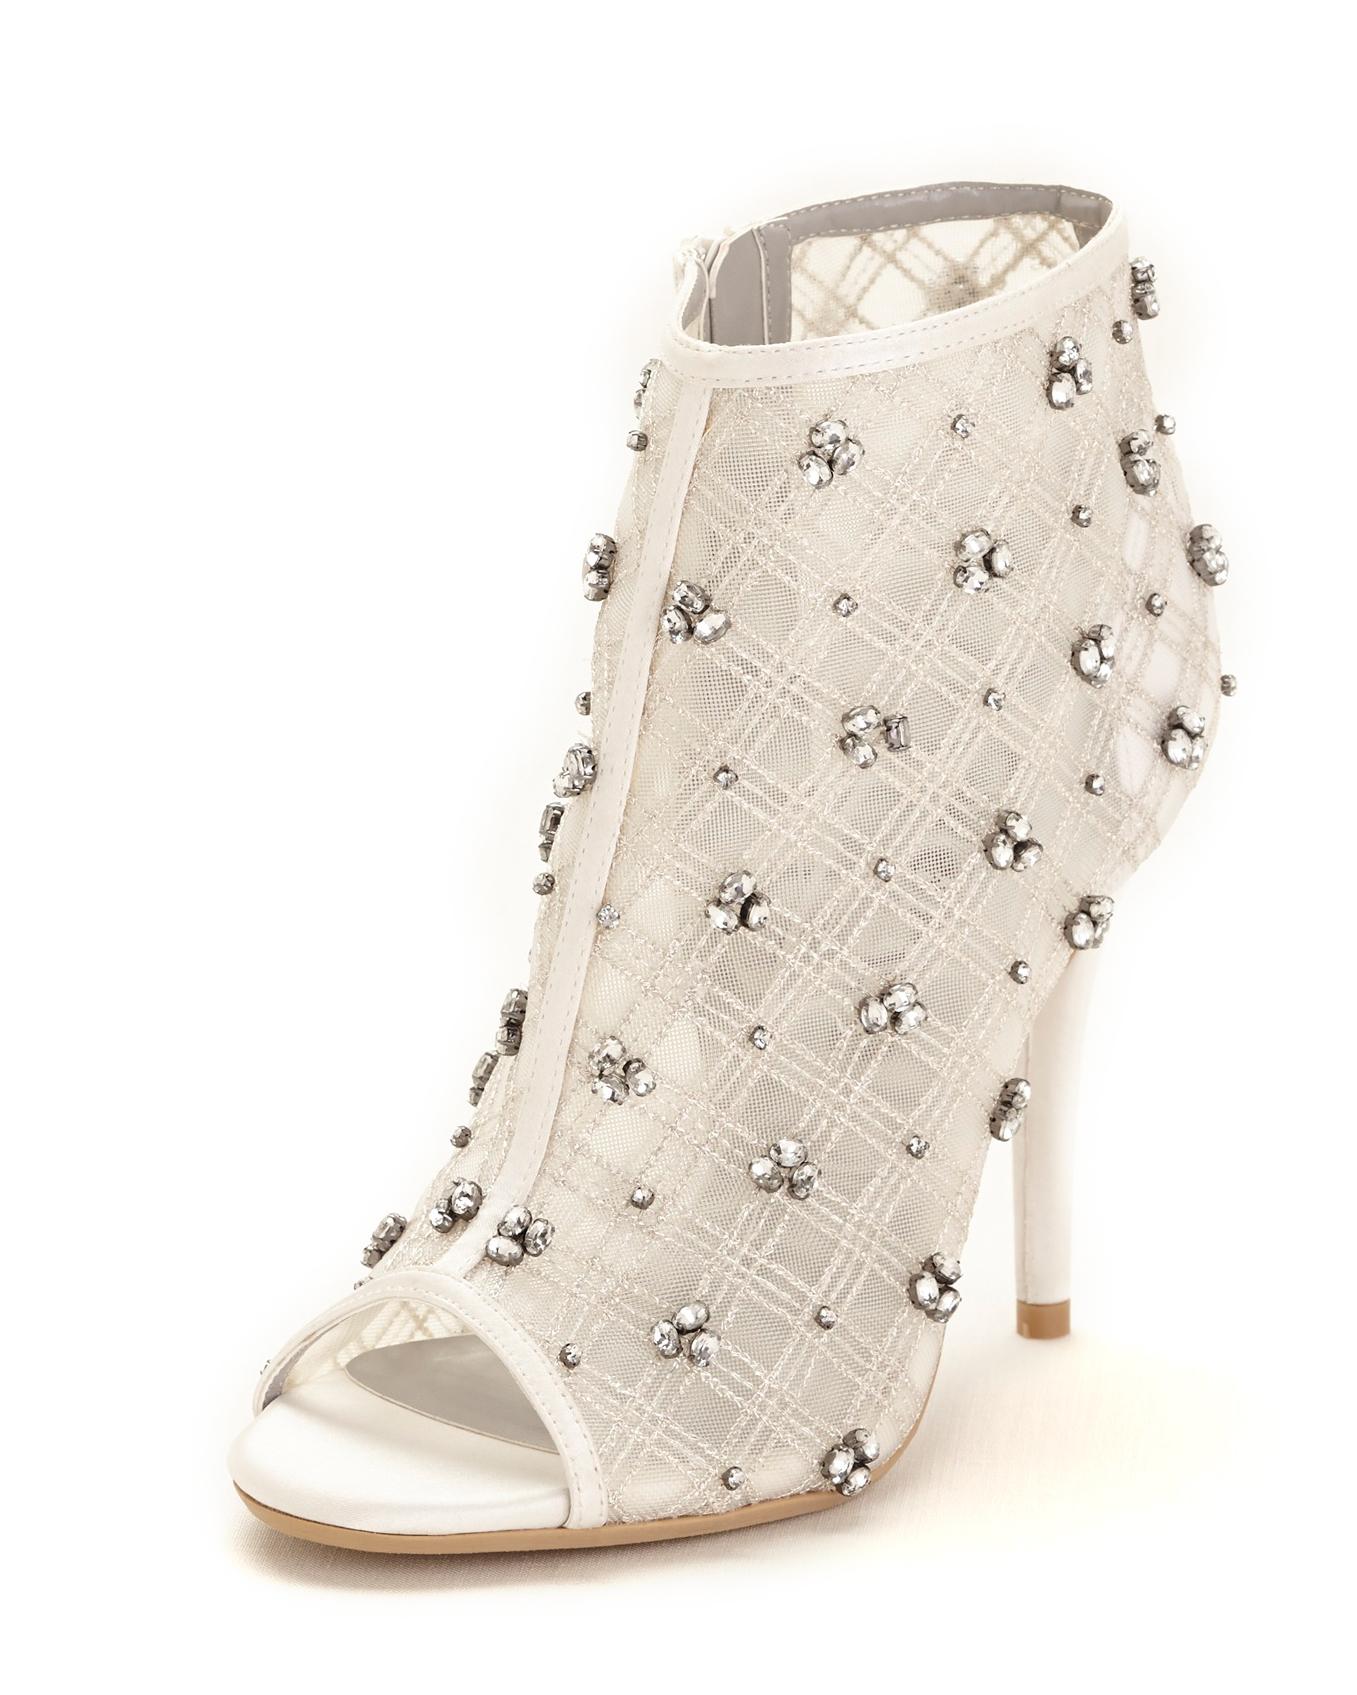 mesh-wedding-shoes-white-by-vera-wang-bootie-0315.jpg